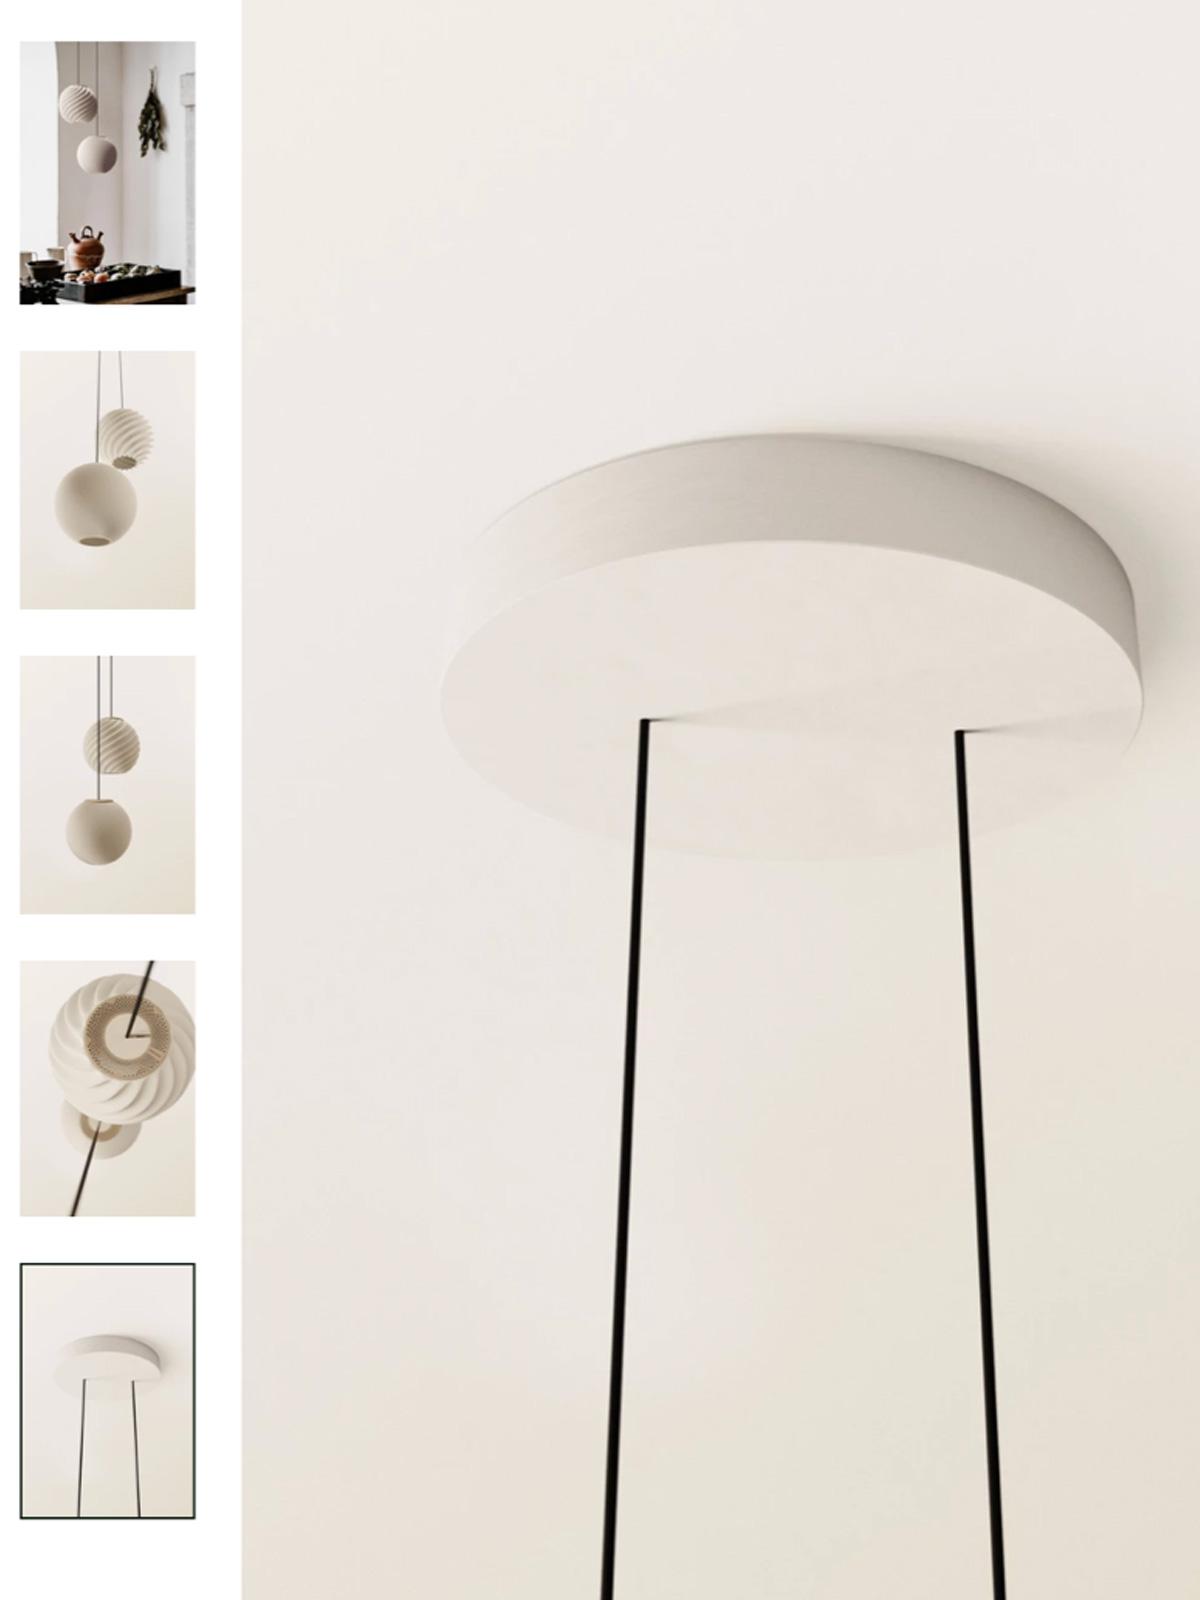 Polyluma Random Pendelleuchte DesignOrt Onlineshop Berlin Lampen Leuchten Design